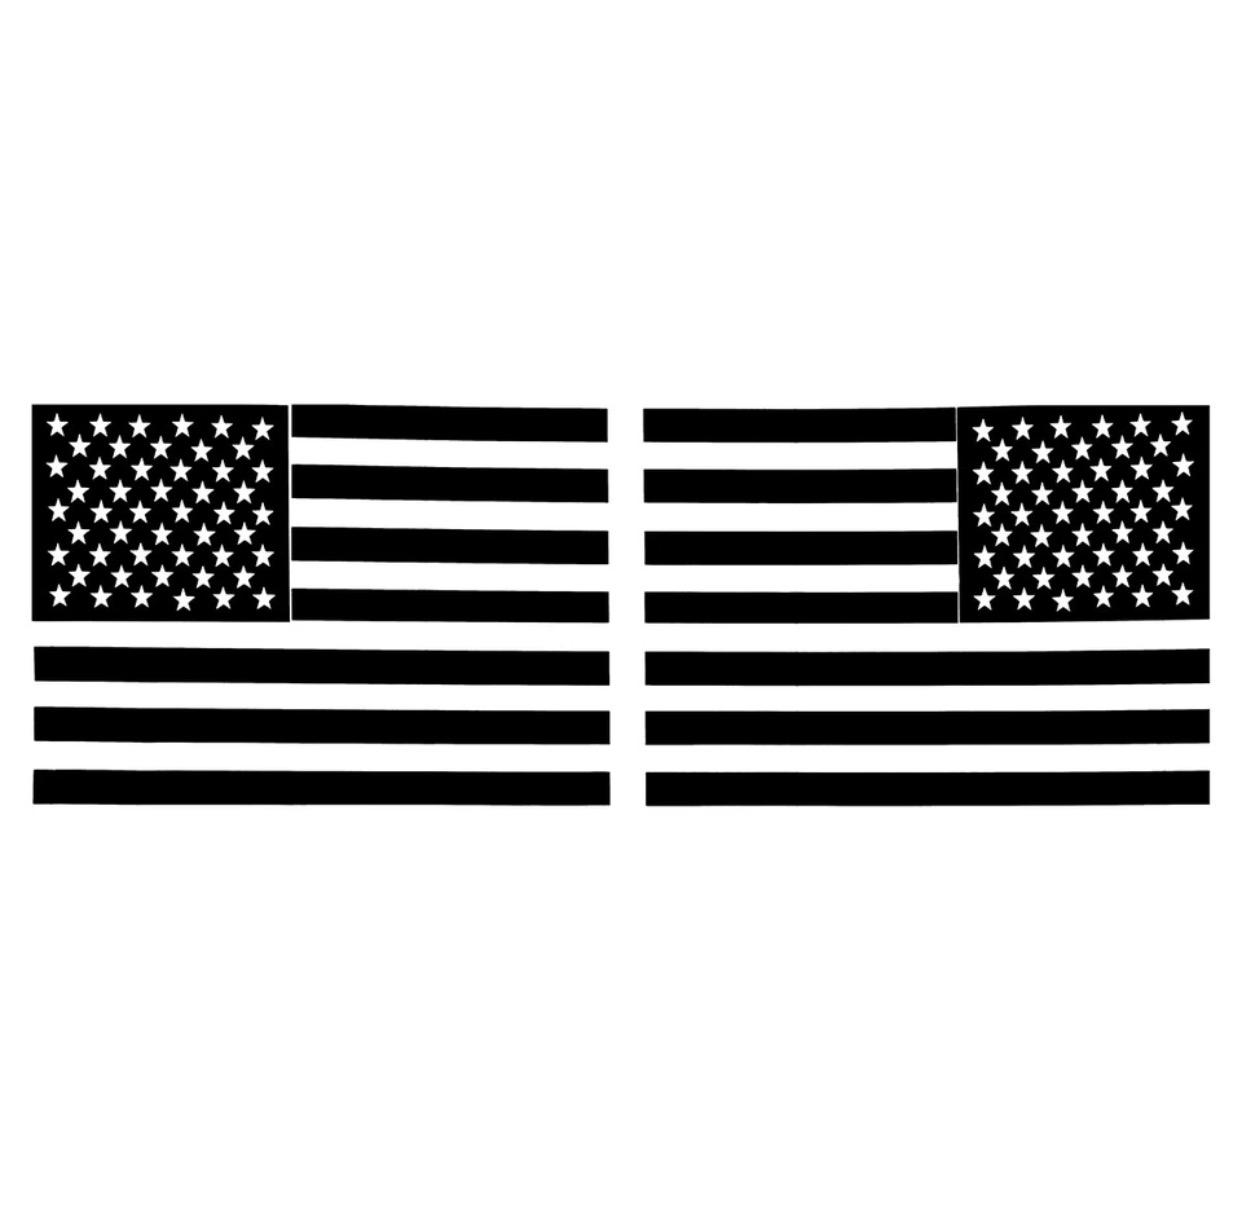 3D Metal American Flag Sticker Decal Mirrored Reverse Car Bike Truck Emblem